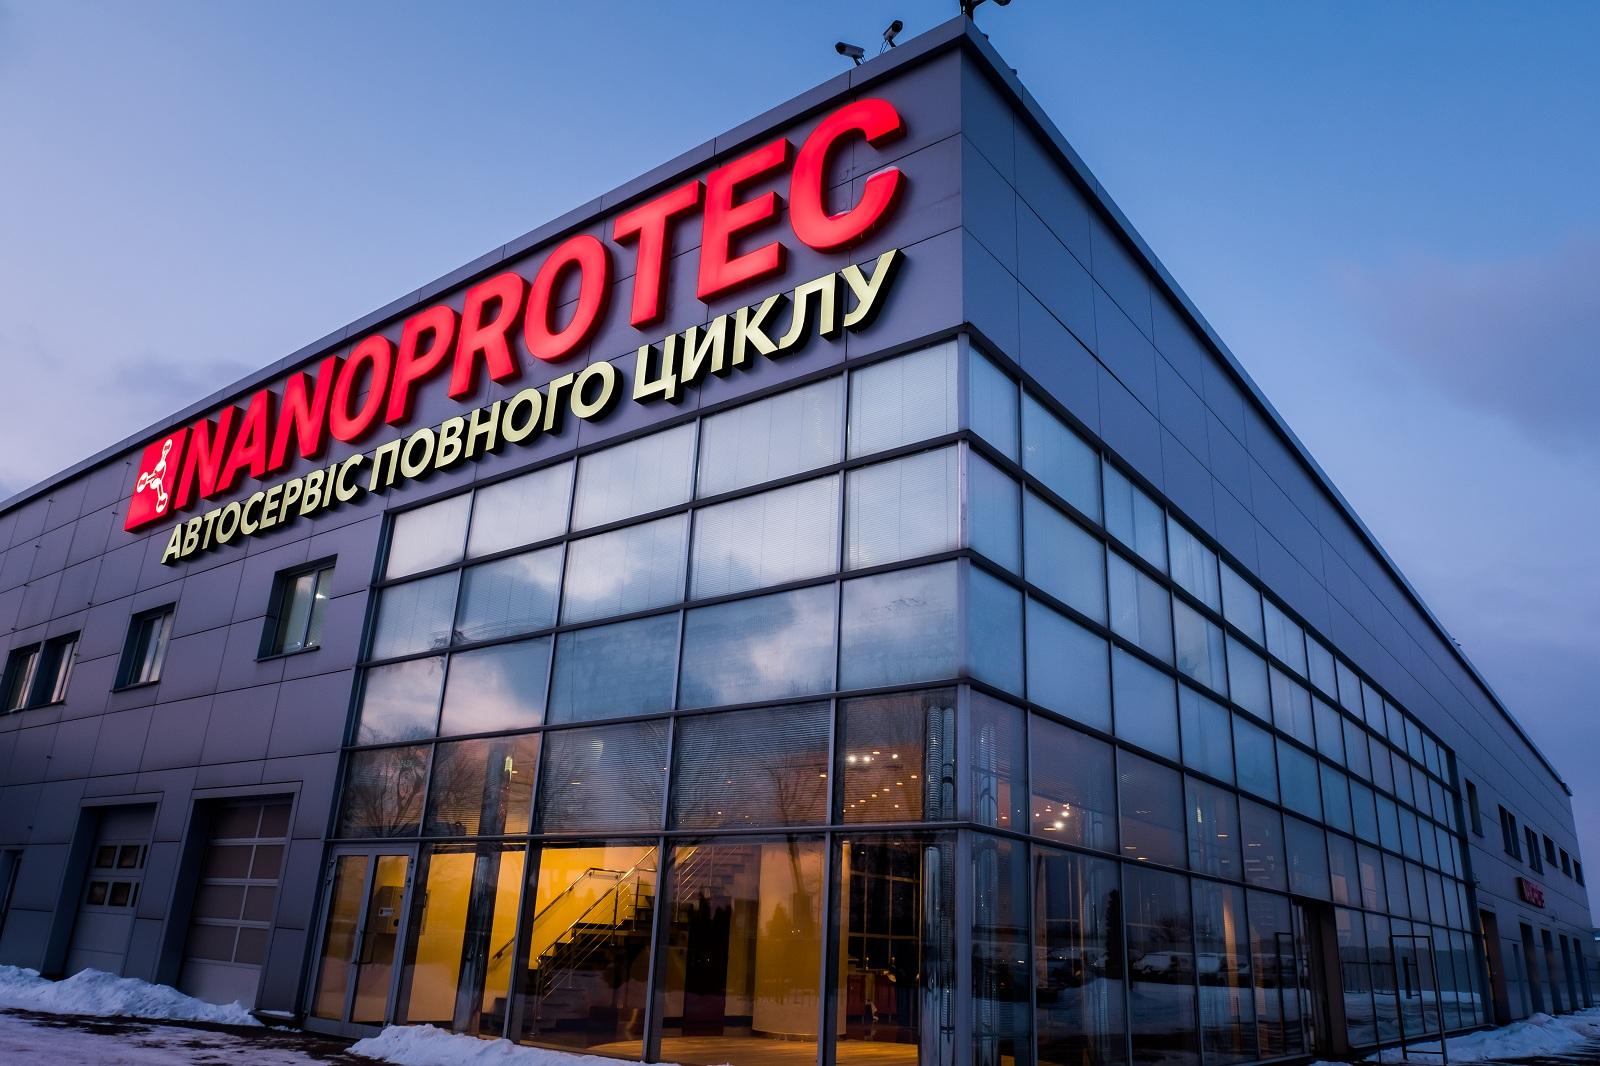 Nanoprotec #10yearschallenge – от стартапа до международного нанопроекта